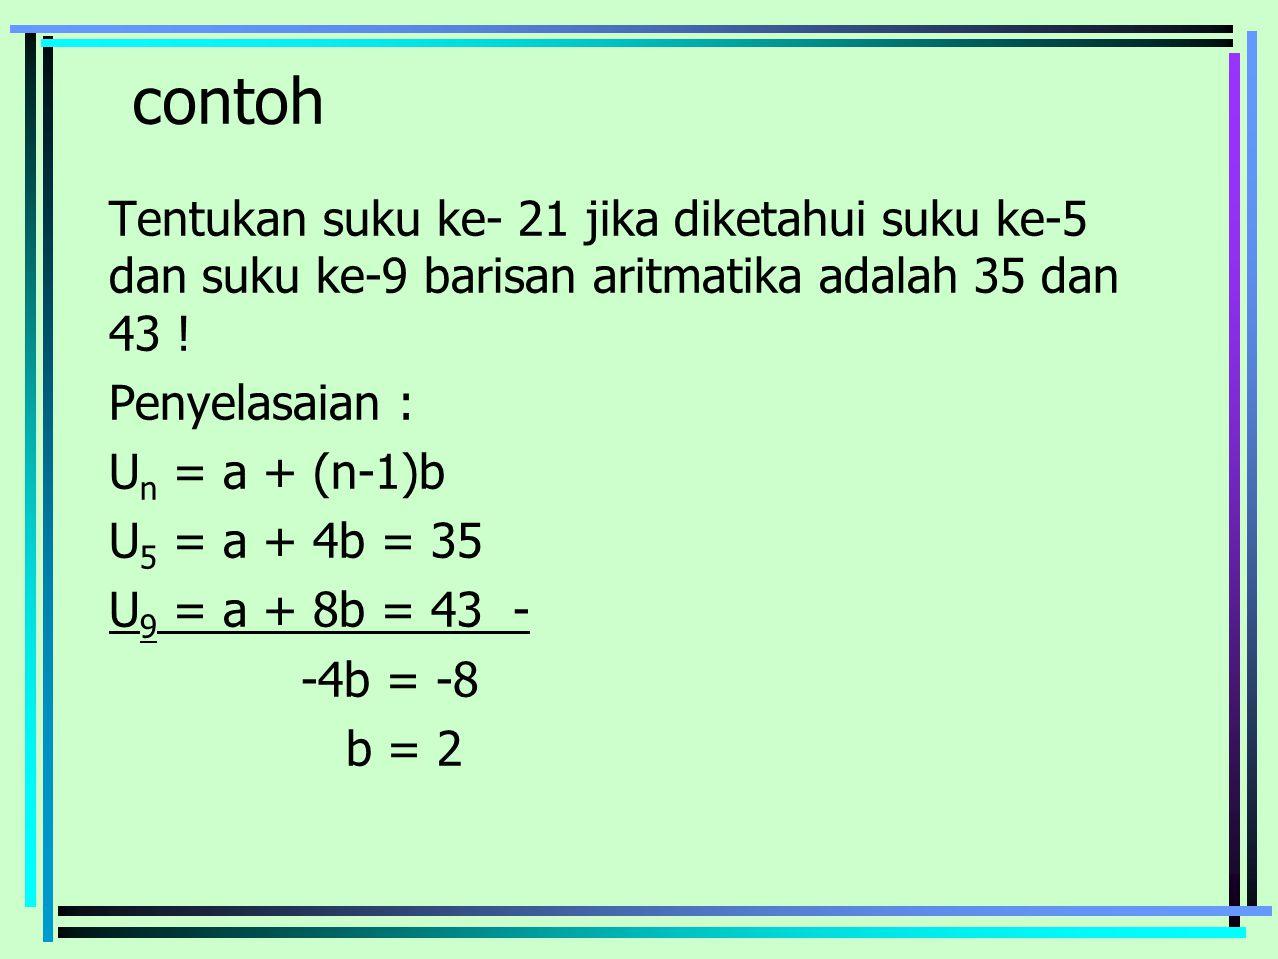 contoh Tentukan suku ke- 21 jika diketahui suku ke-5 dan suku ke-9 barisan aritmatika adalah 35 dan 43 ! Penyelasaian : U n = a + (n-1)b U 5 = a + 4b